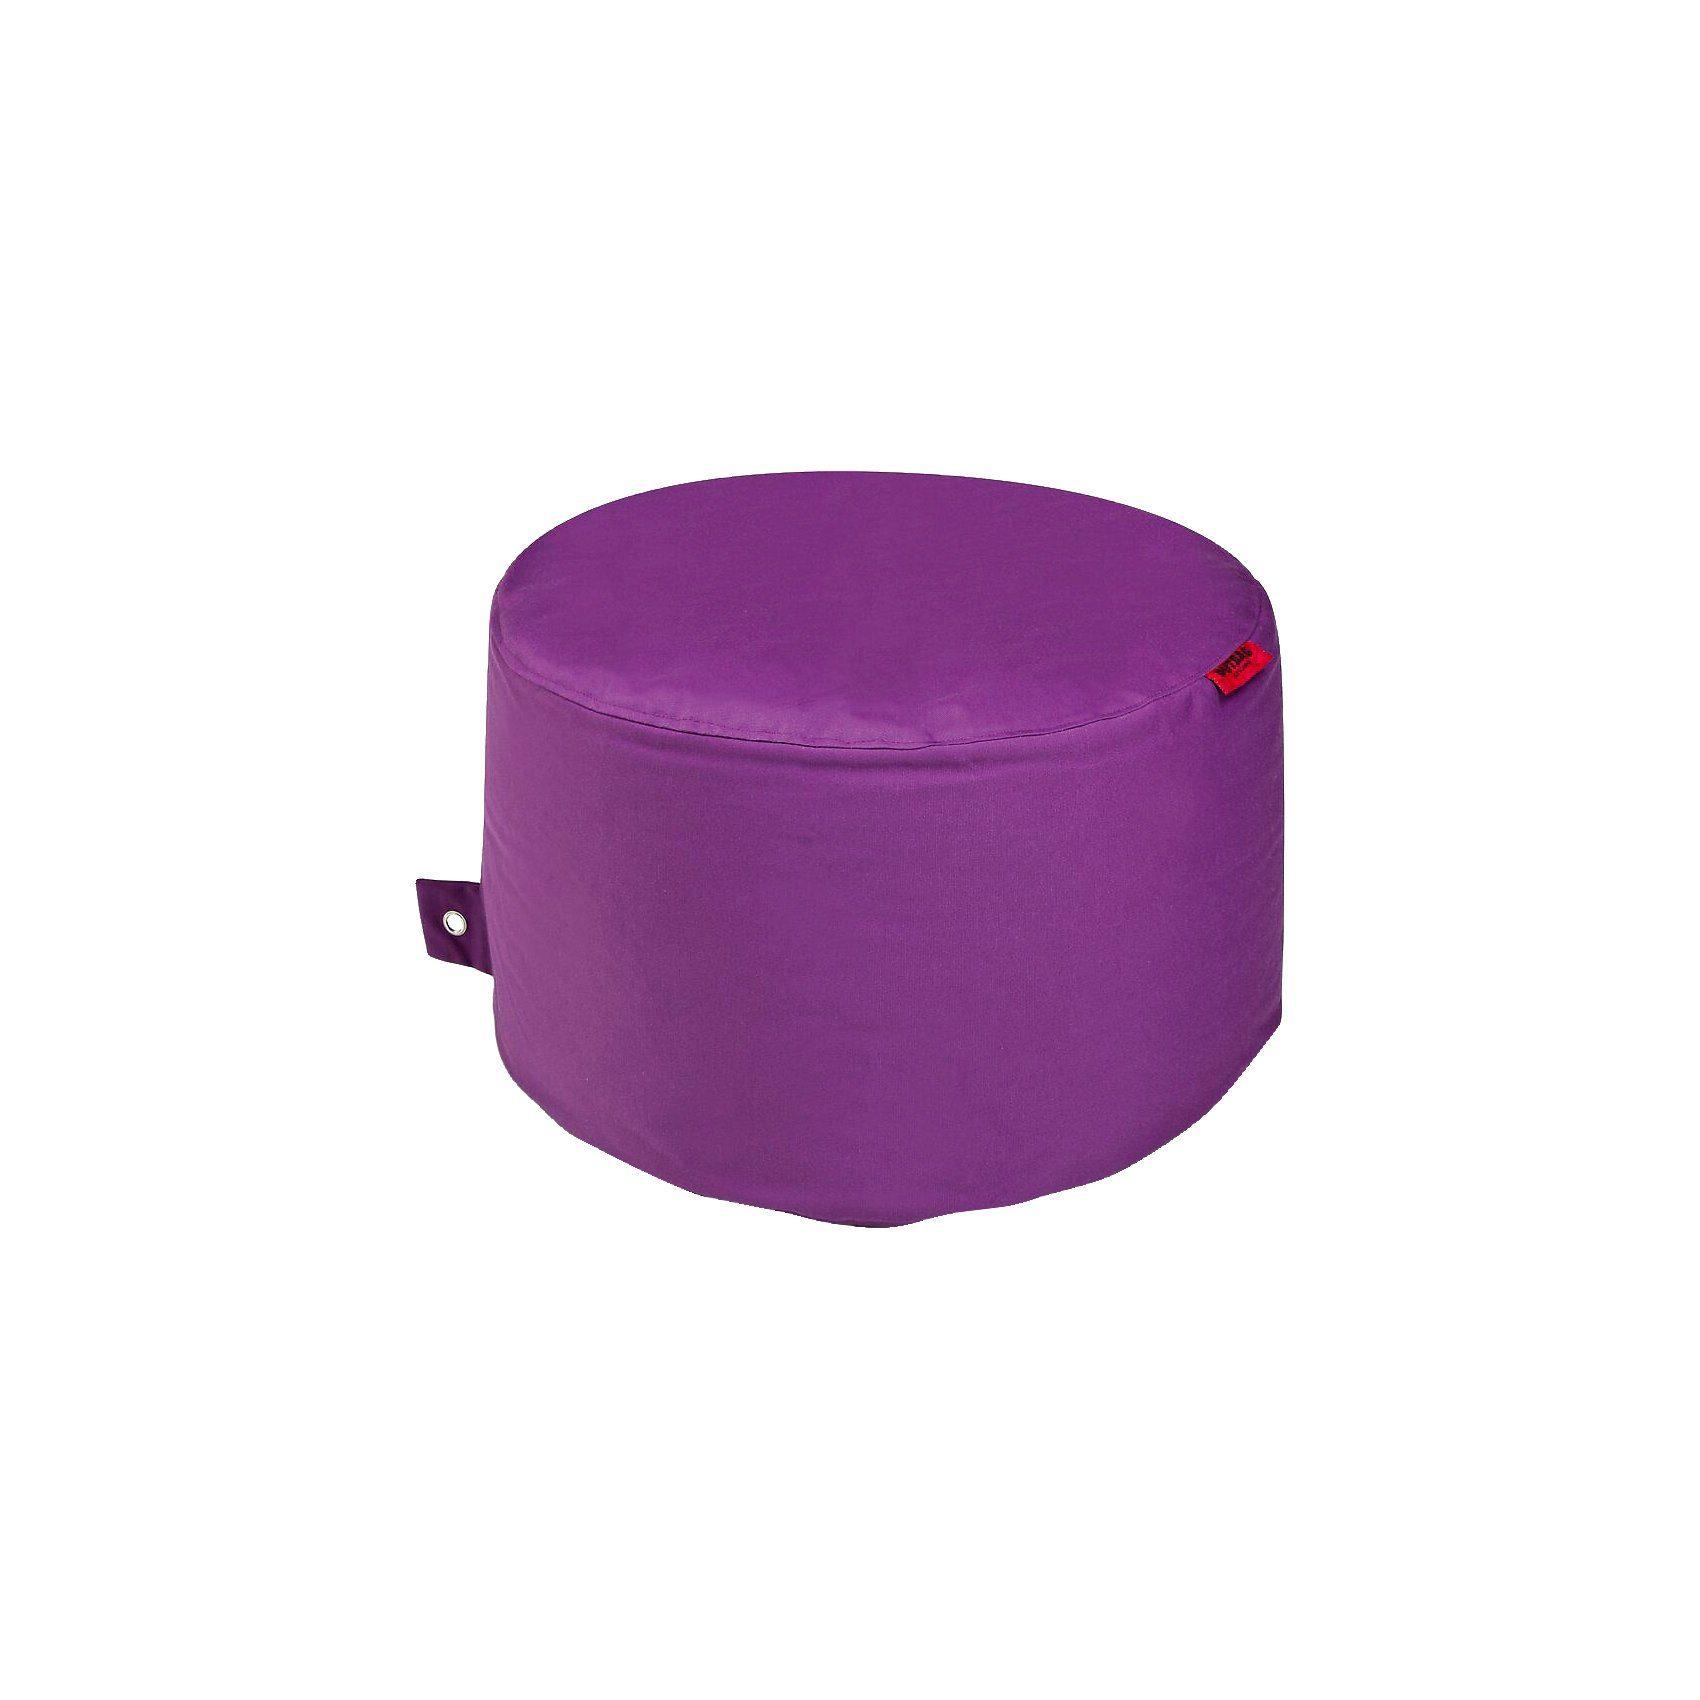 Outdoor-Sitzsack Rock, Plus, purple